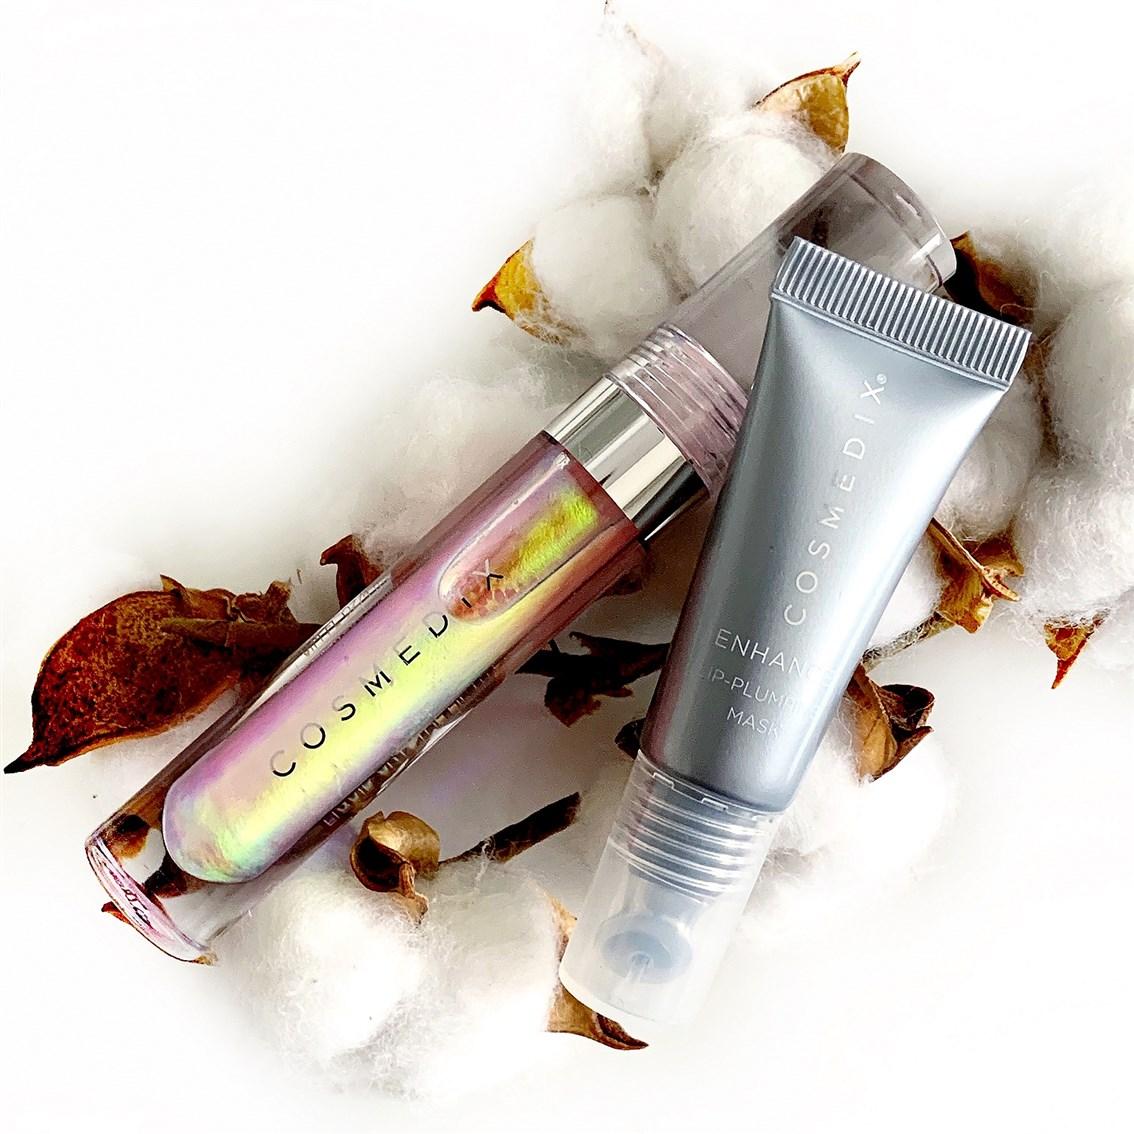 Cosmedix Lumi Crystal Liquid Lip Hydrator opinie blog recenzja